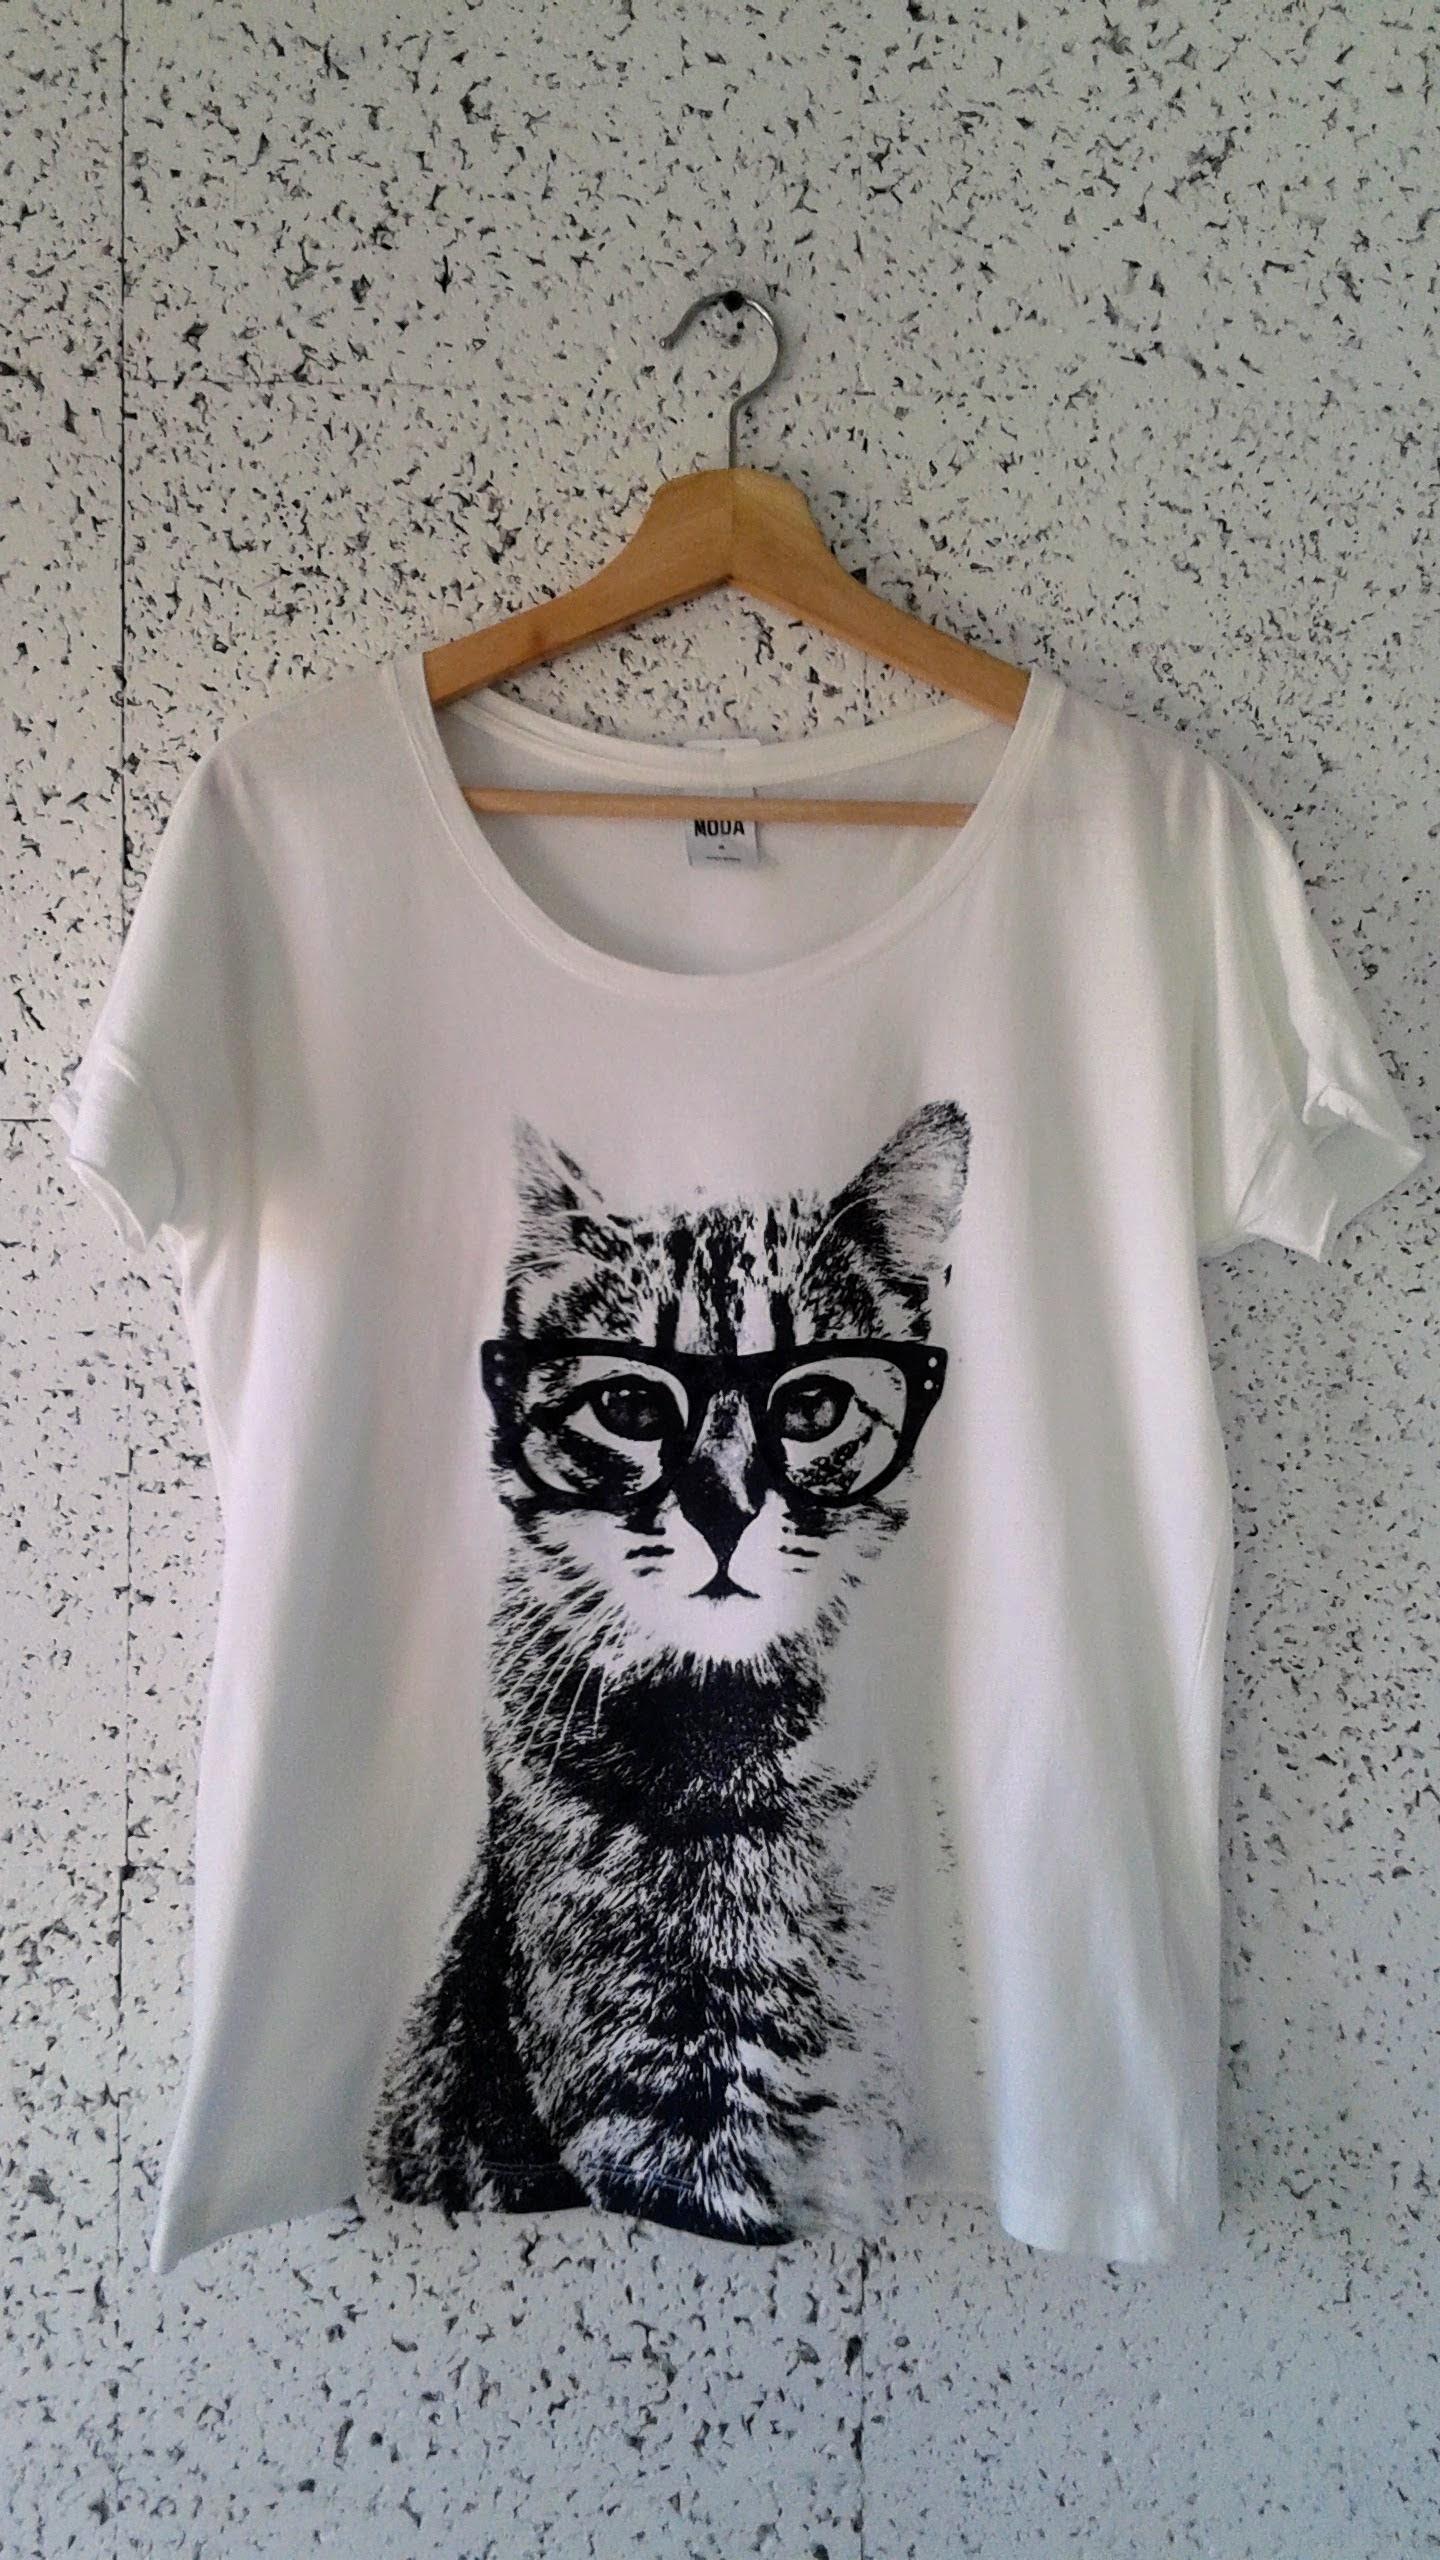 Vero Moda top; Size M, $20